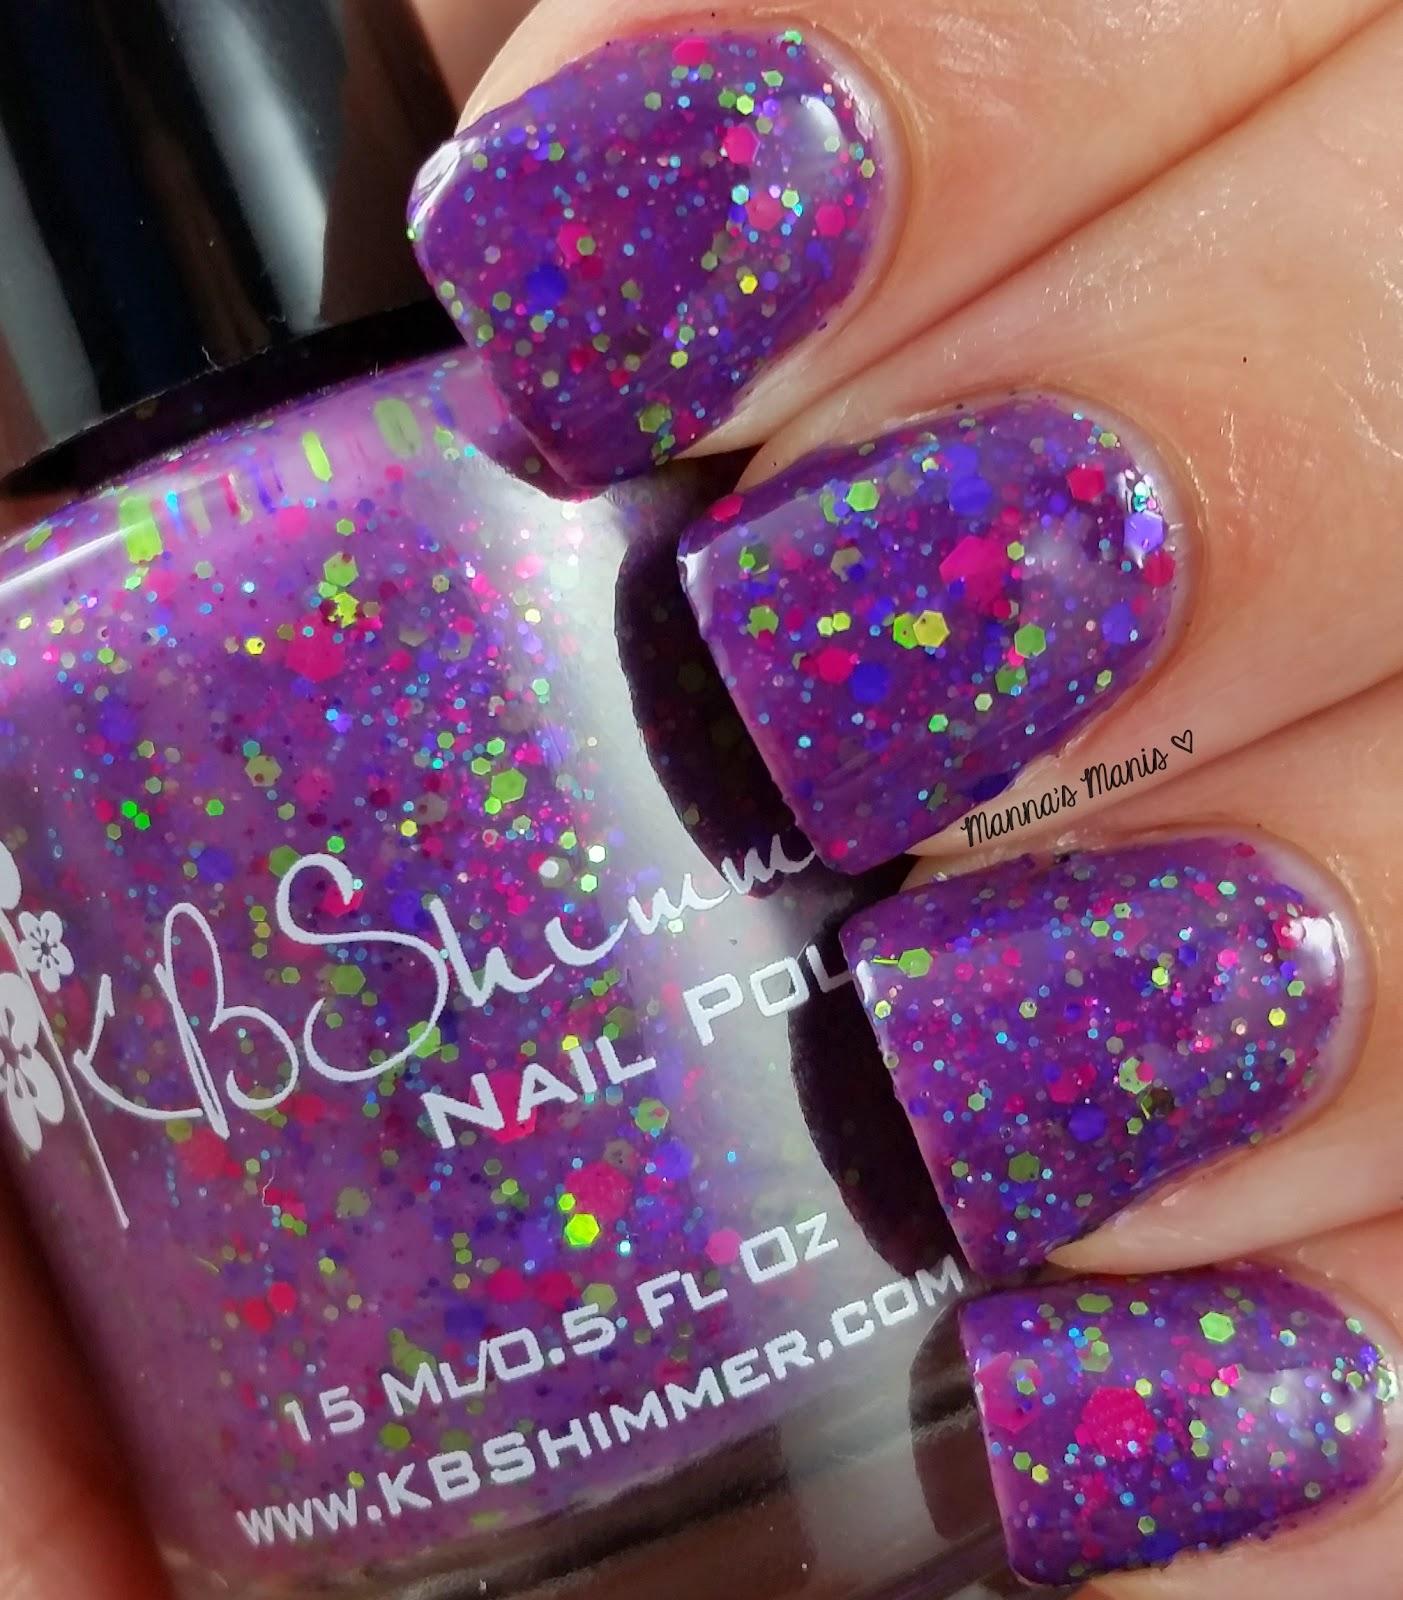 kbshimmer sugar plum faerie, a purple crelly nail polish